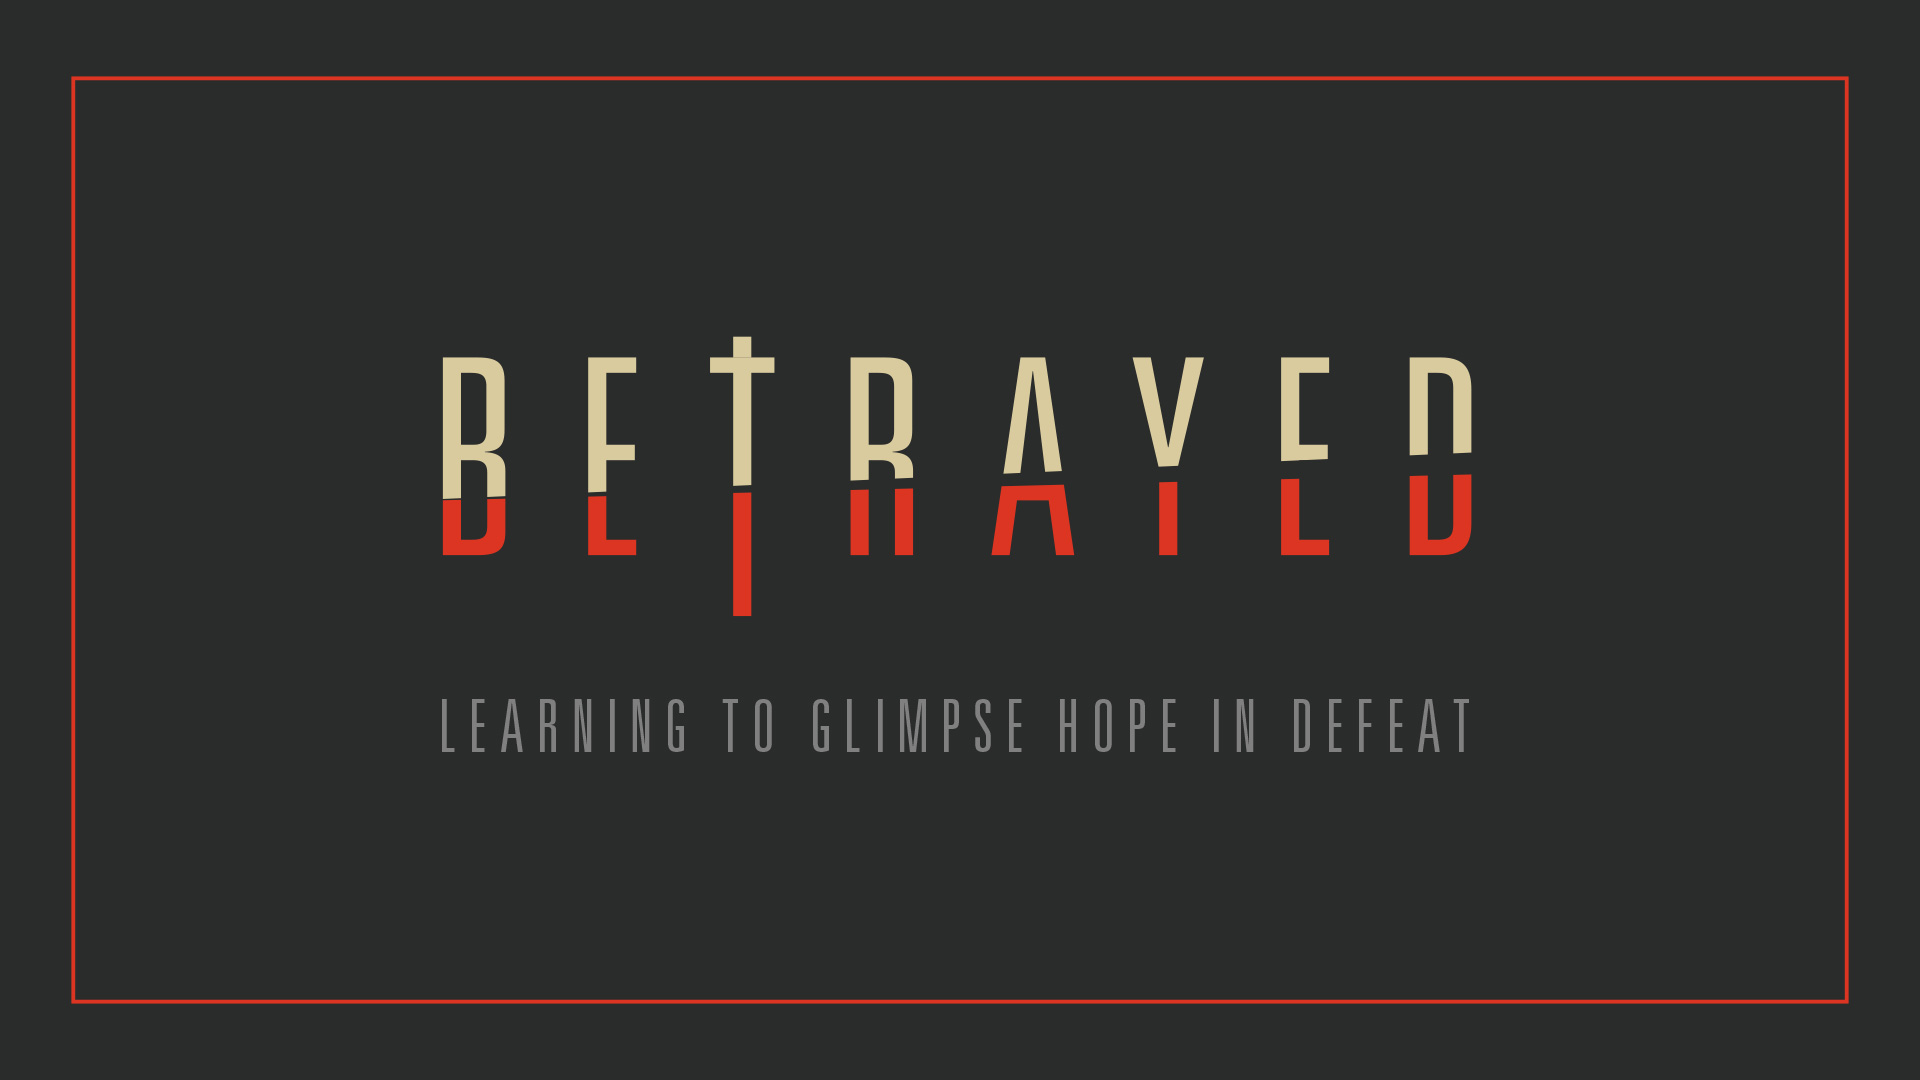 Betrayed_140812B-1.jpg